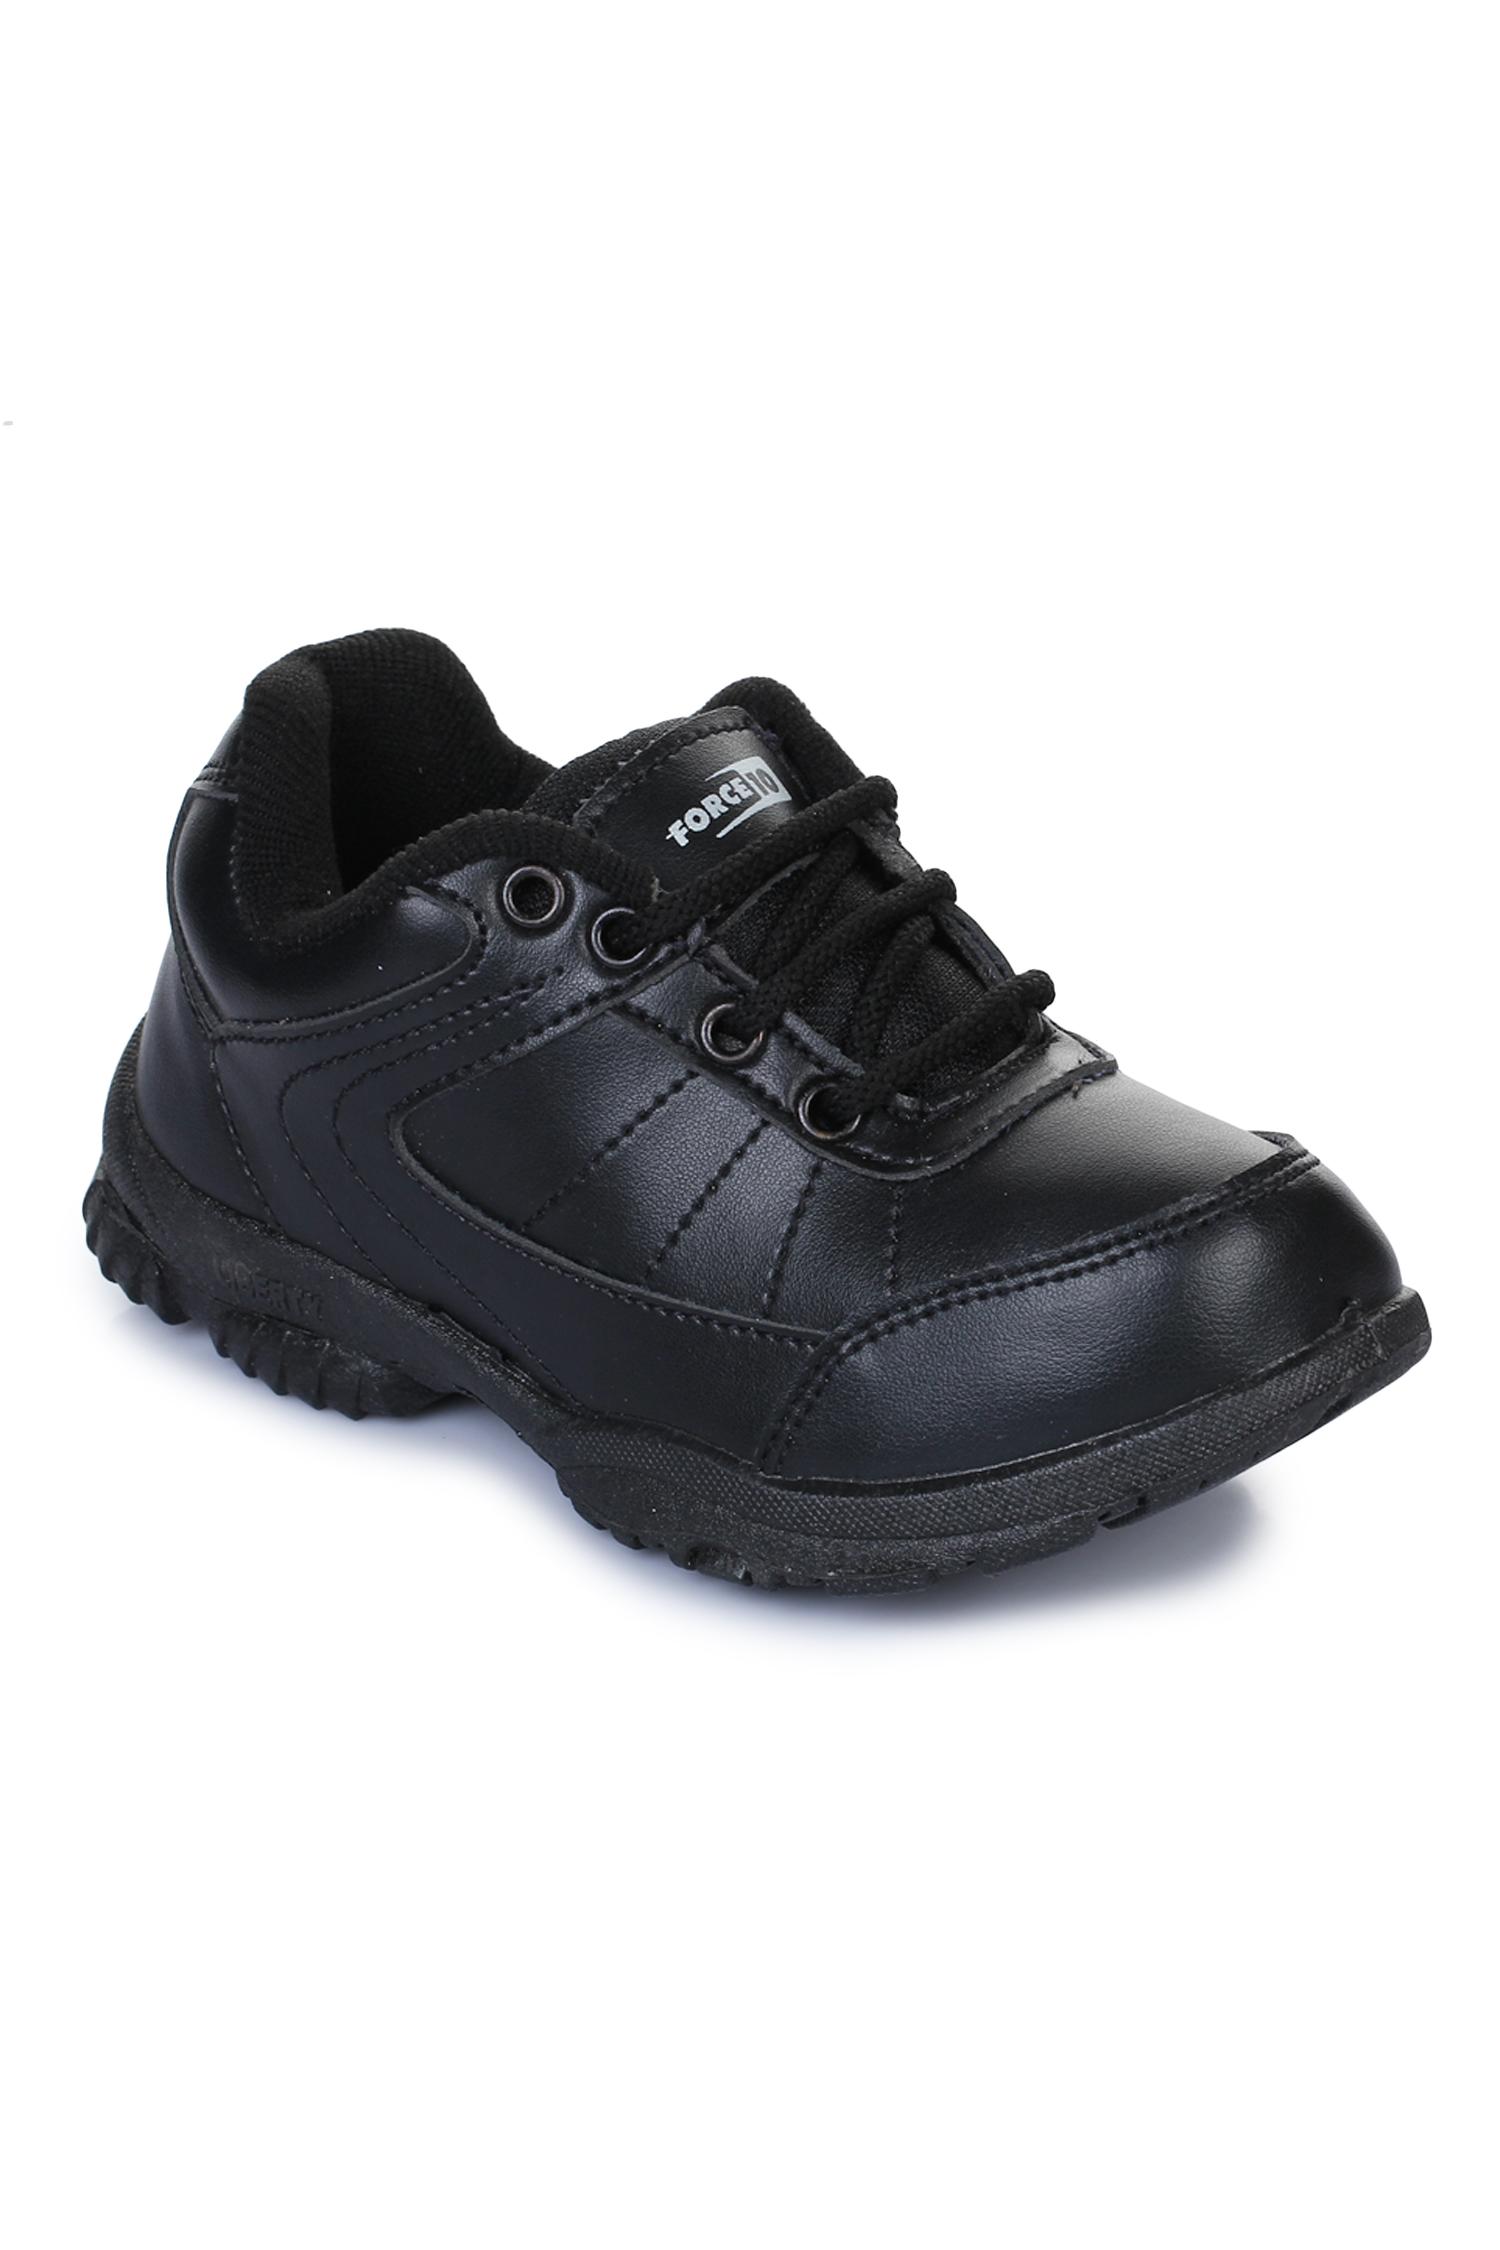 Liberty | Liberty FORCE 10 School Shoes SCHZONE_BLACK For - Boys